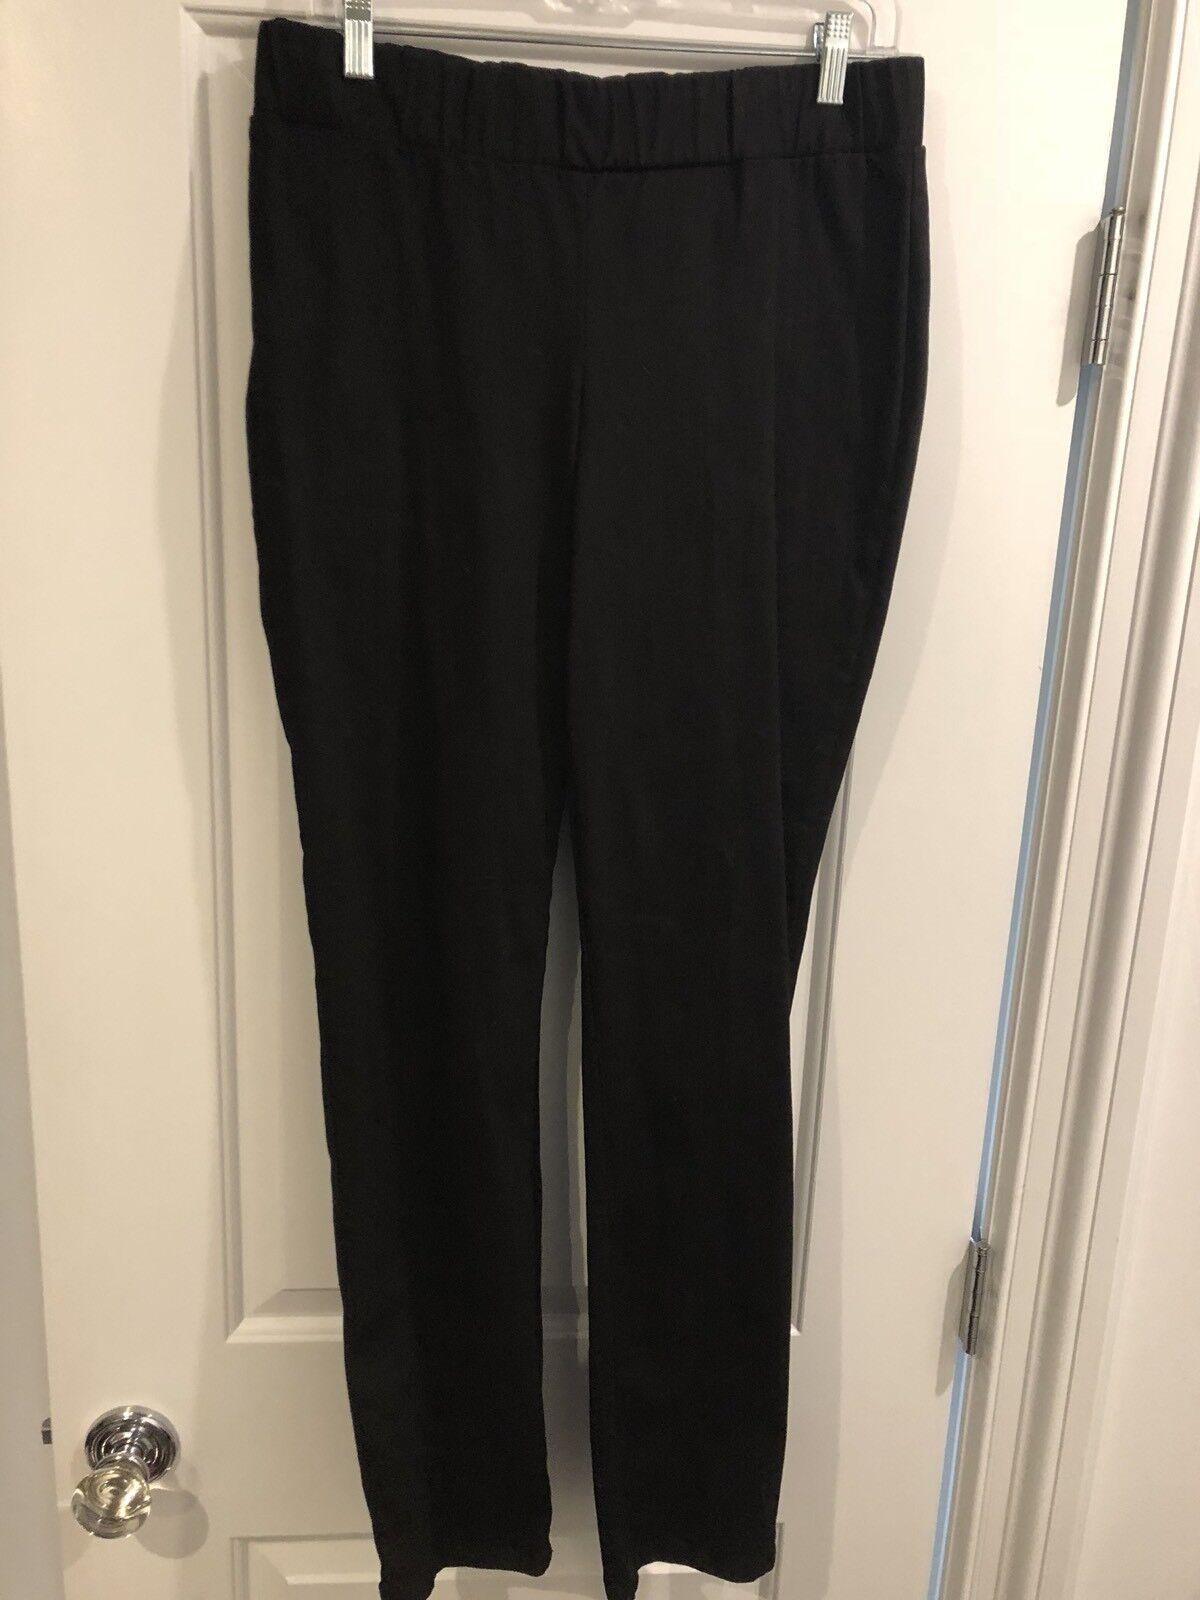 New Cabi Stretch Elastic Waist Dark Skinny Jean Large L